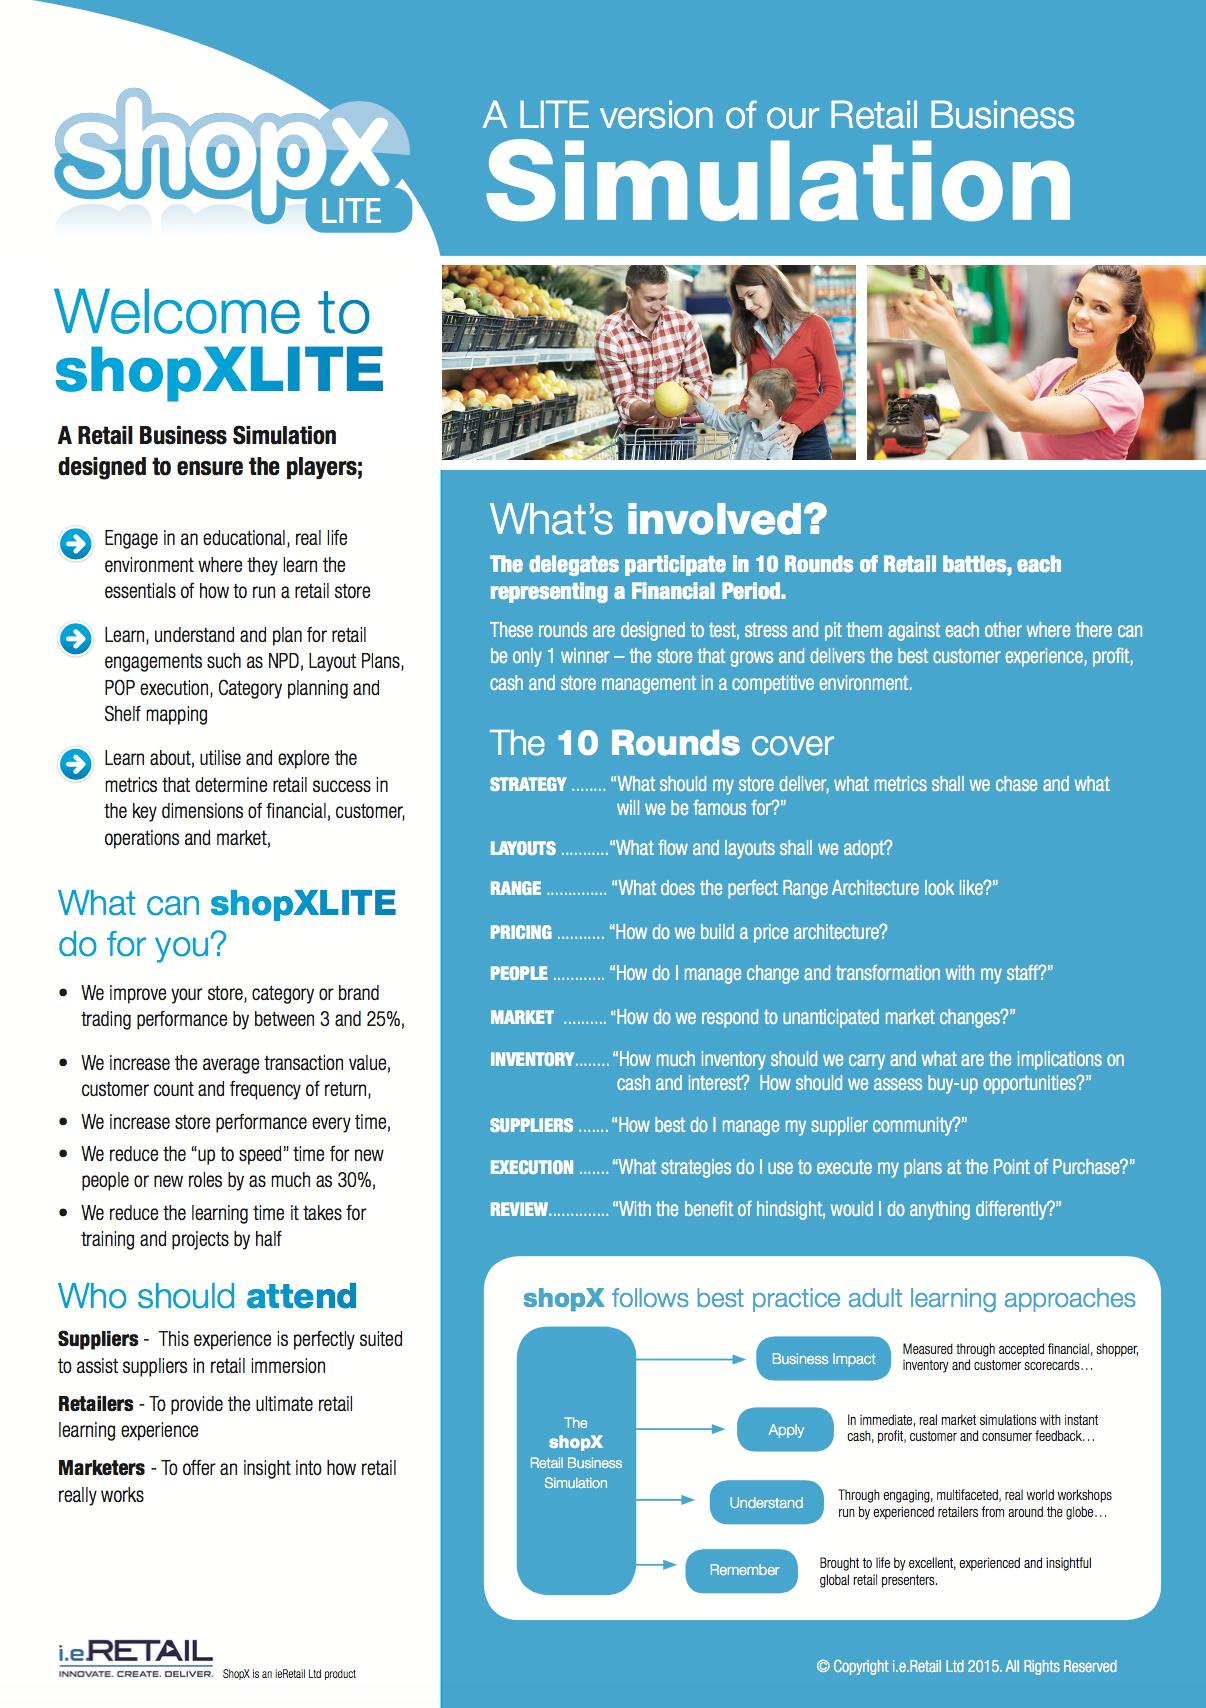 ShopX Lite